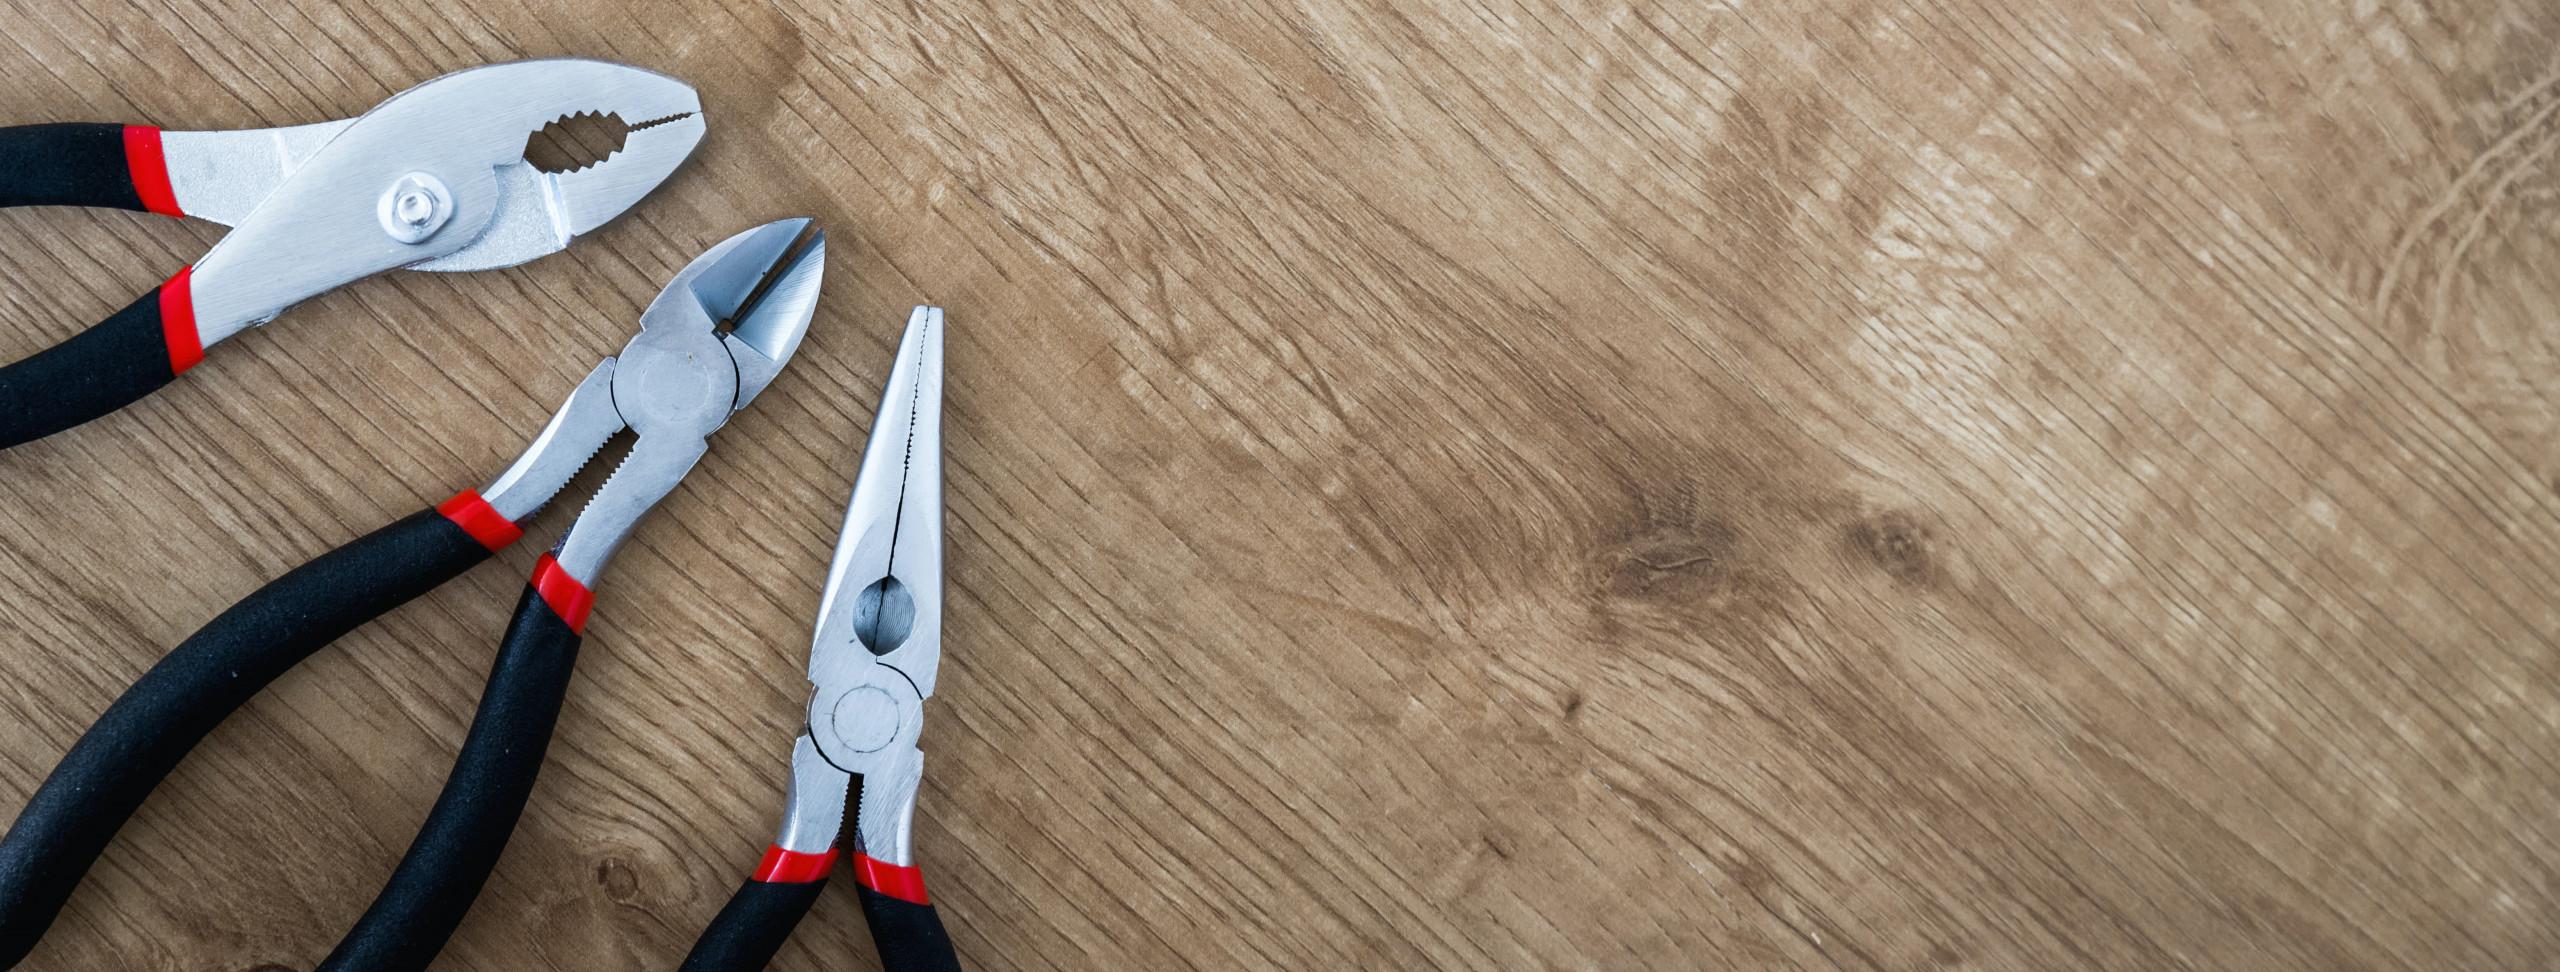 ferramentas-manuais-alicate-martelo-chave-fenda-trena-caixa-reparo-metal-cabo